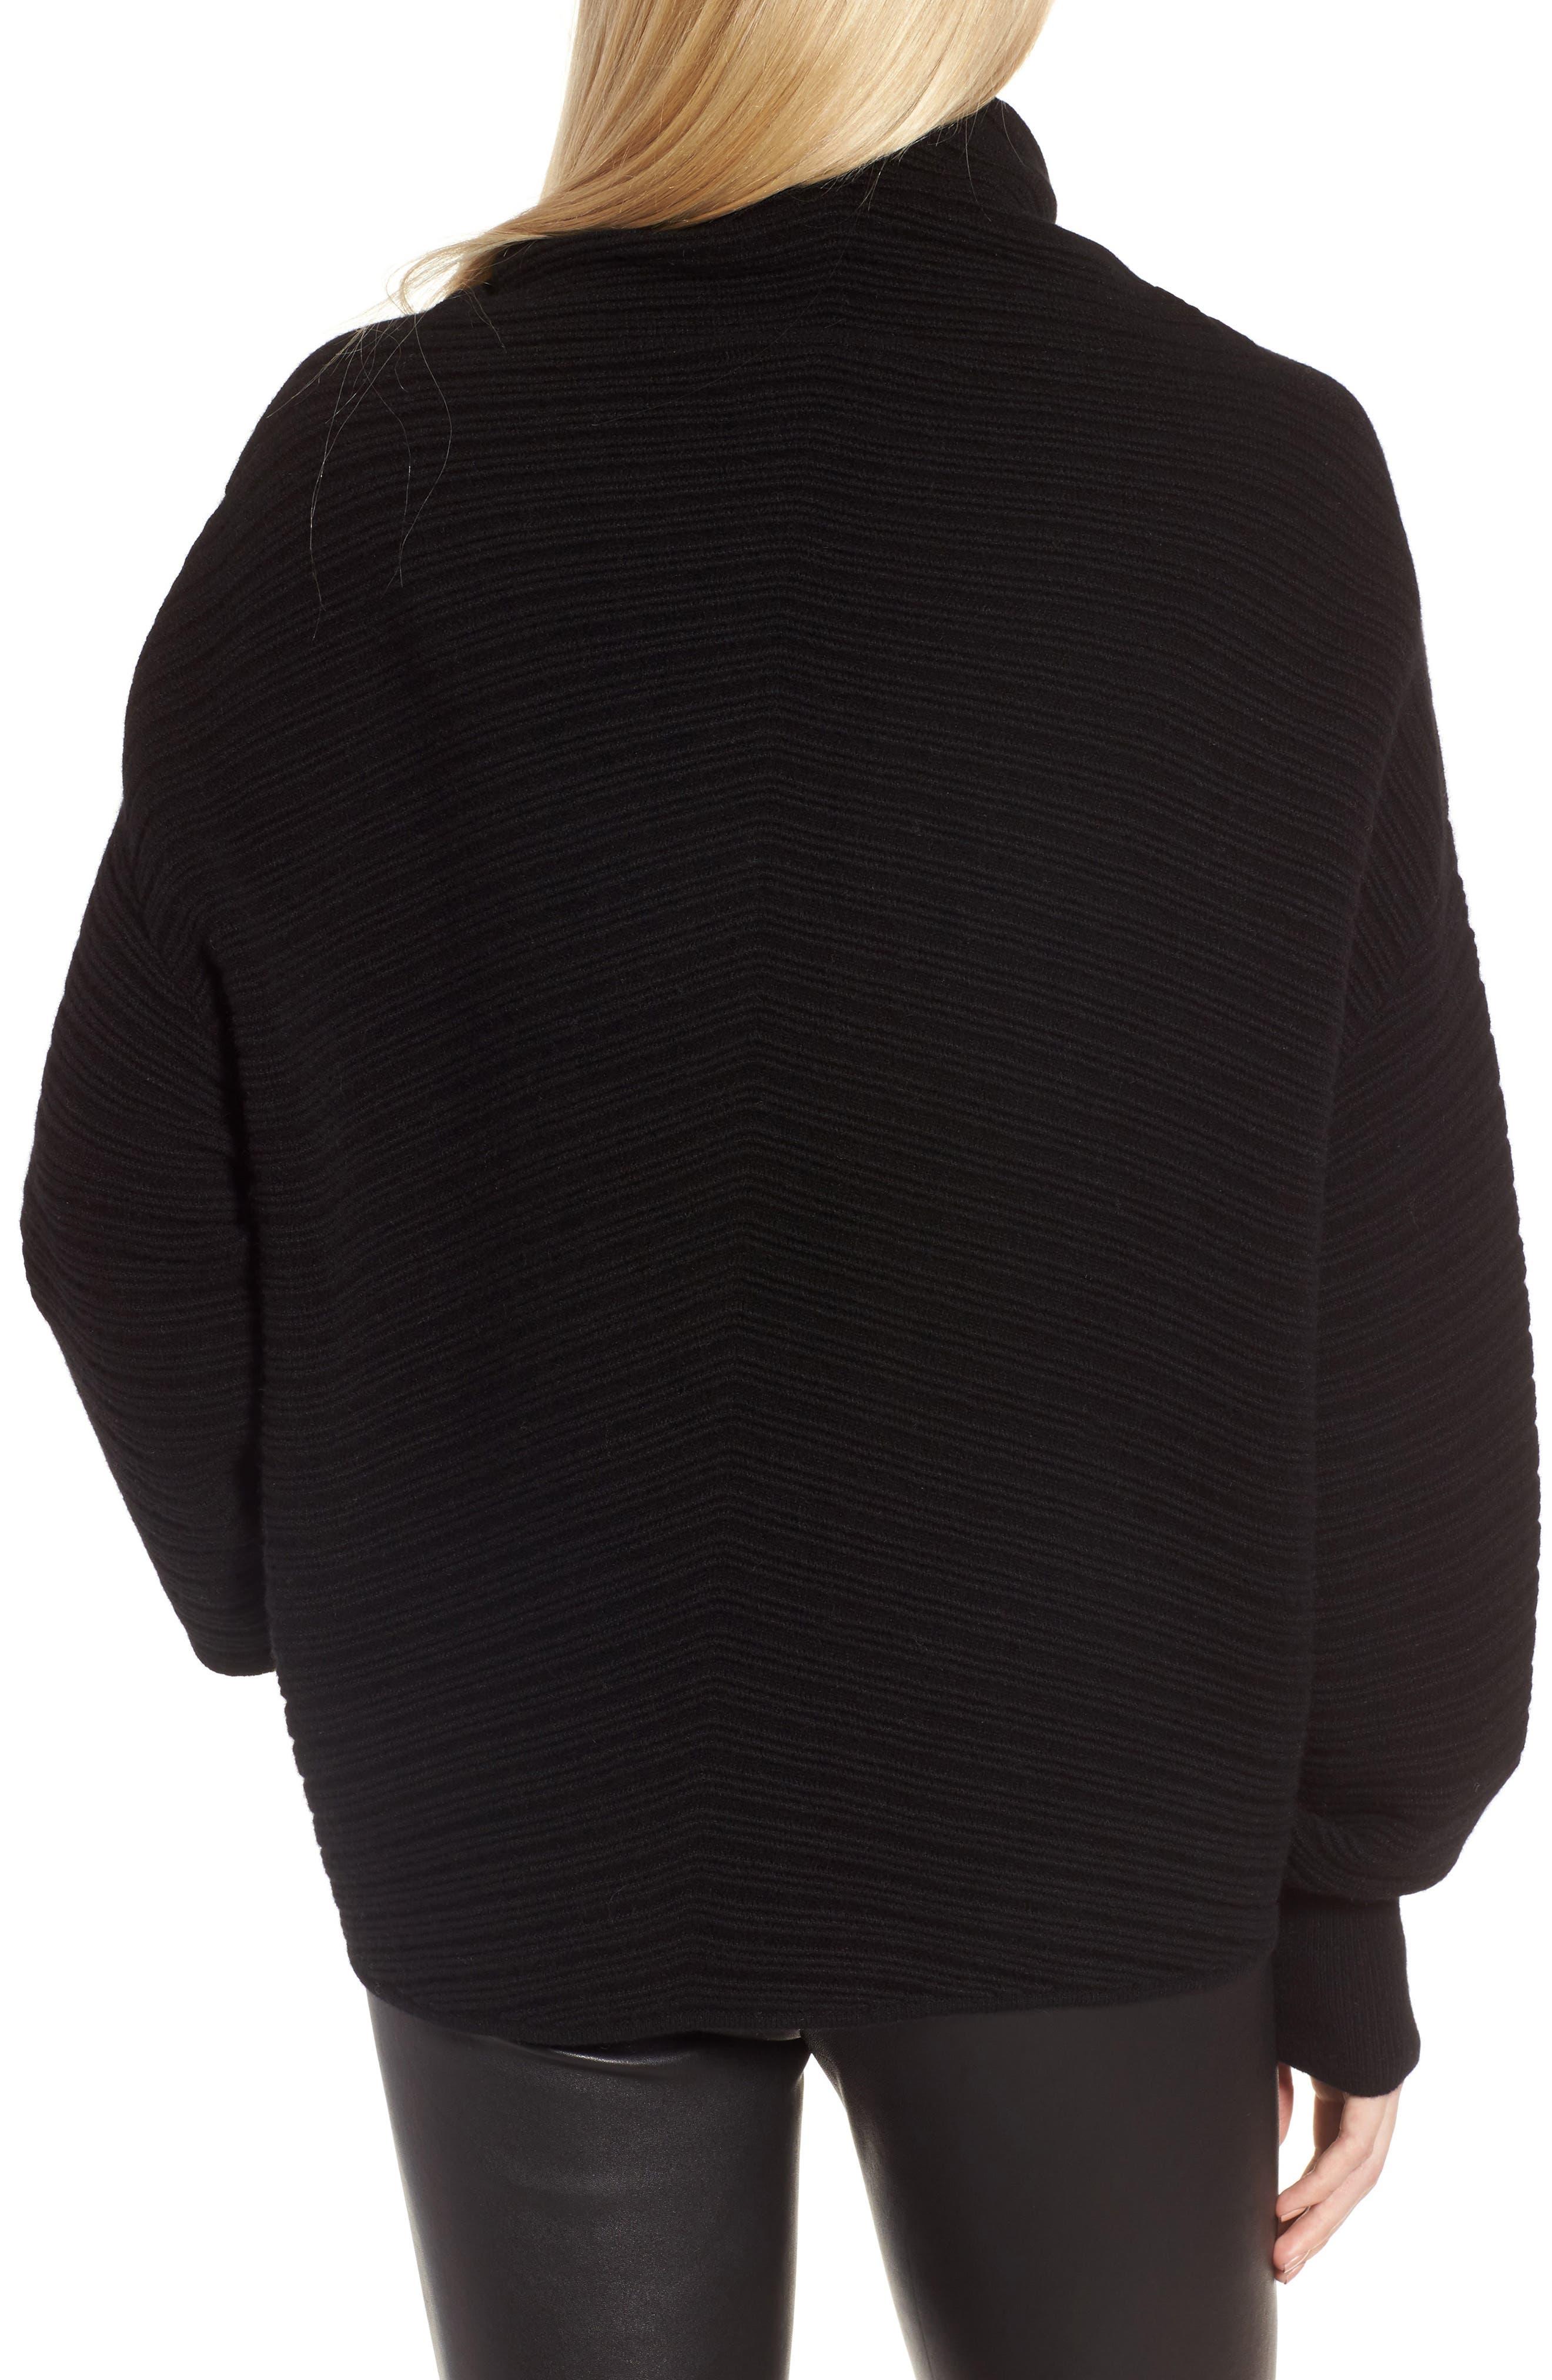 Scrunch Neck Ottoman Knit Cashmere Sweater,                             Alternate thumbnail 2, color,                             Black